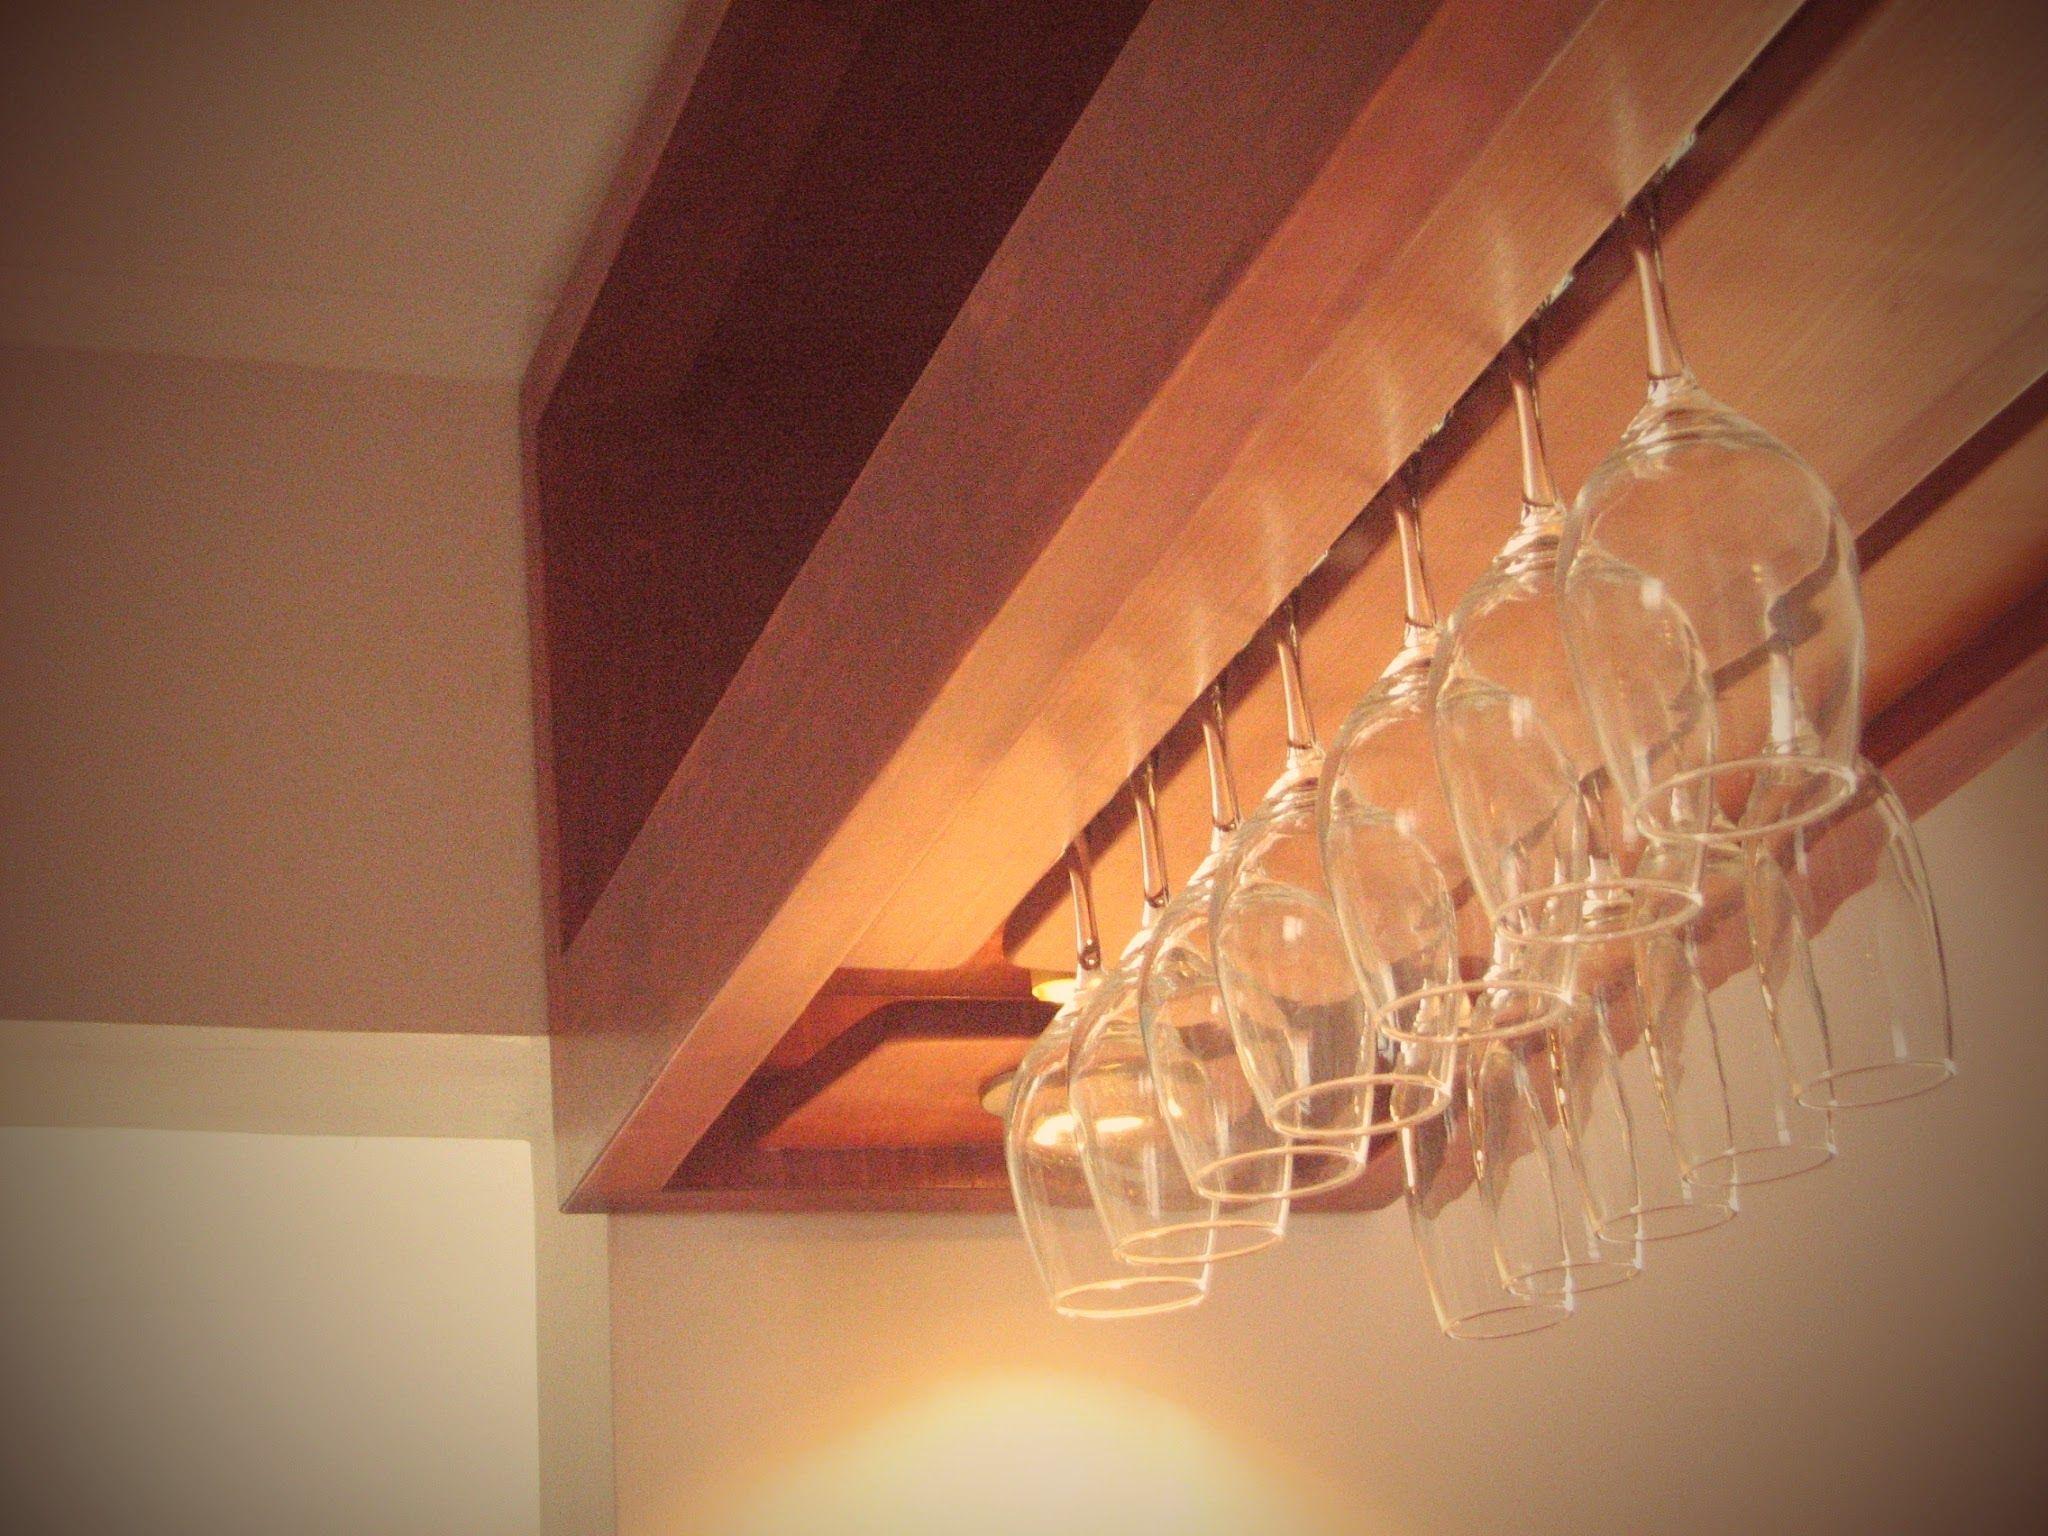 Mueble colgante repisas y copero bar pinterest for Bar modelos madera